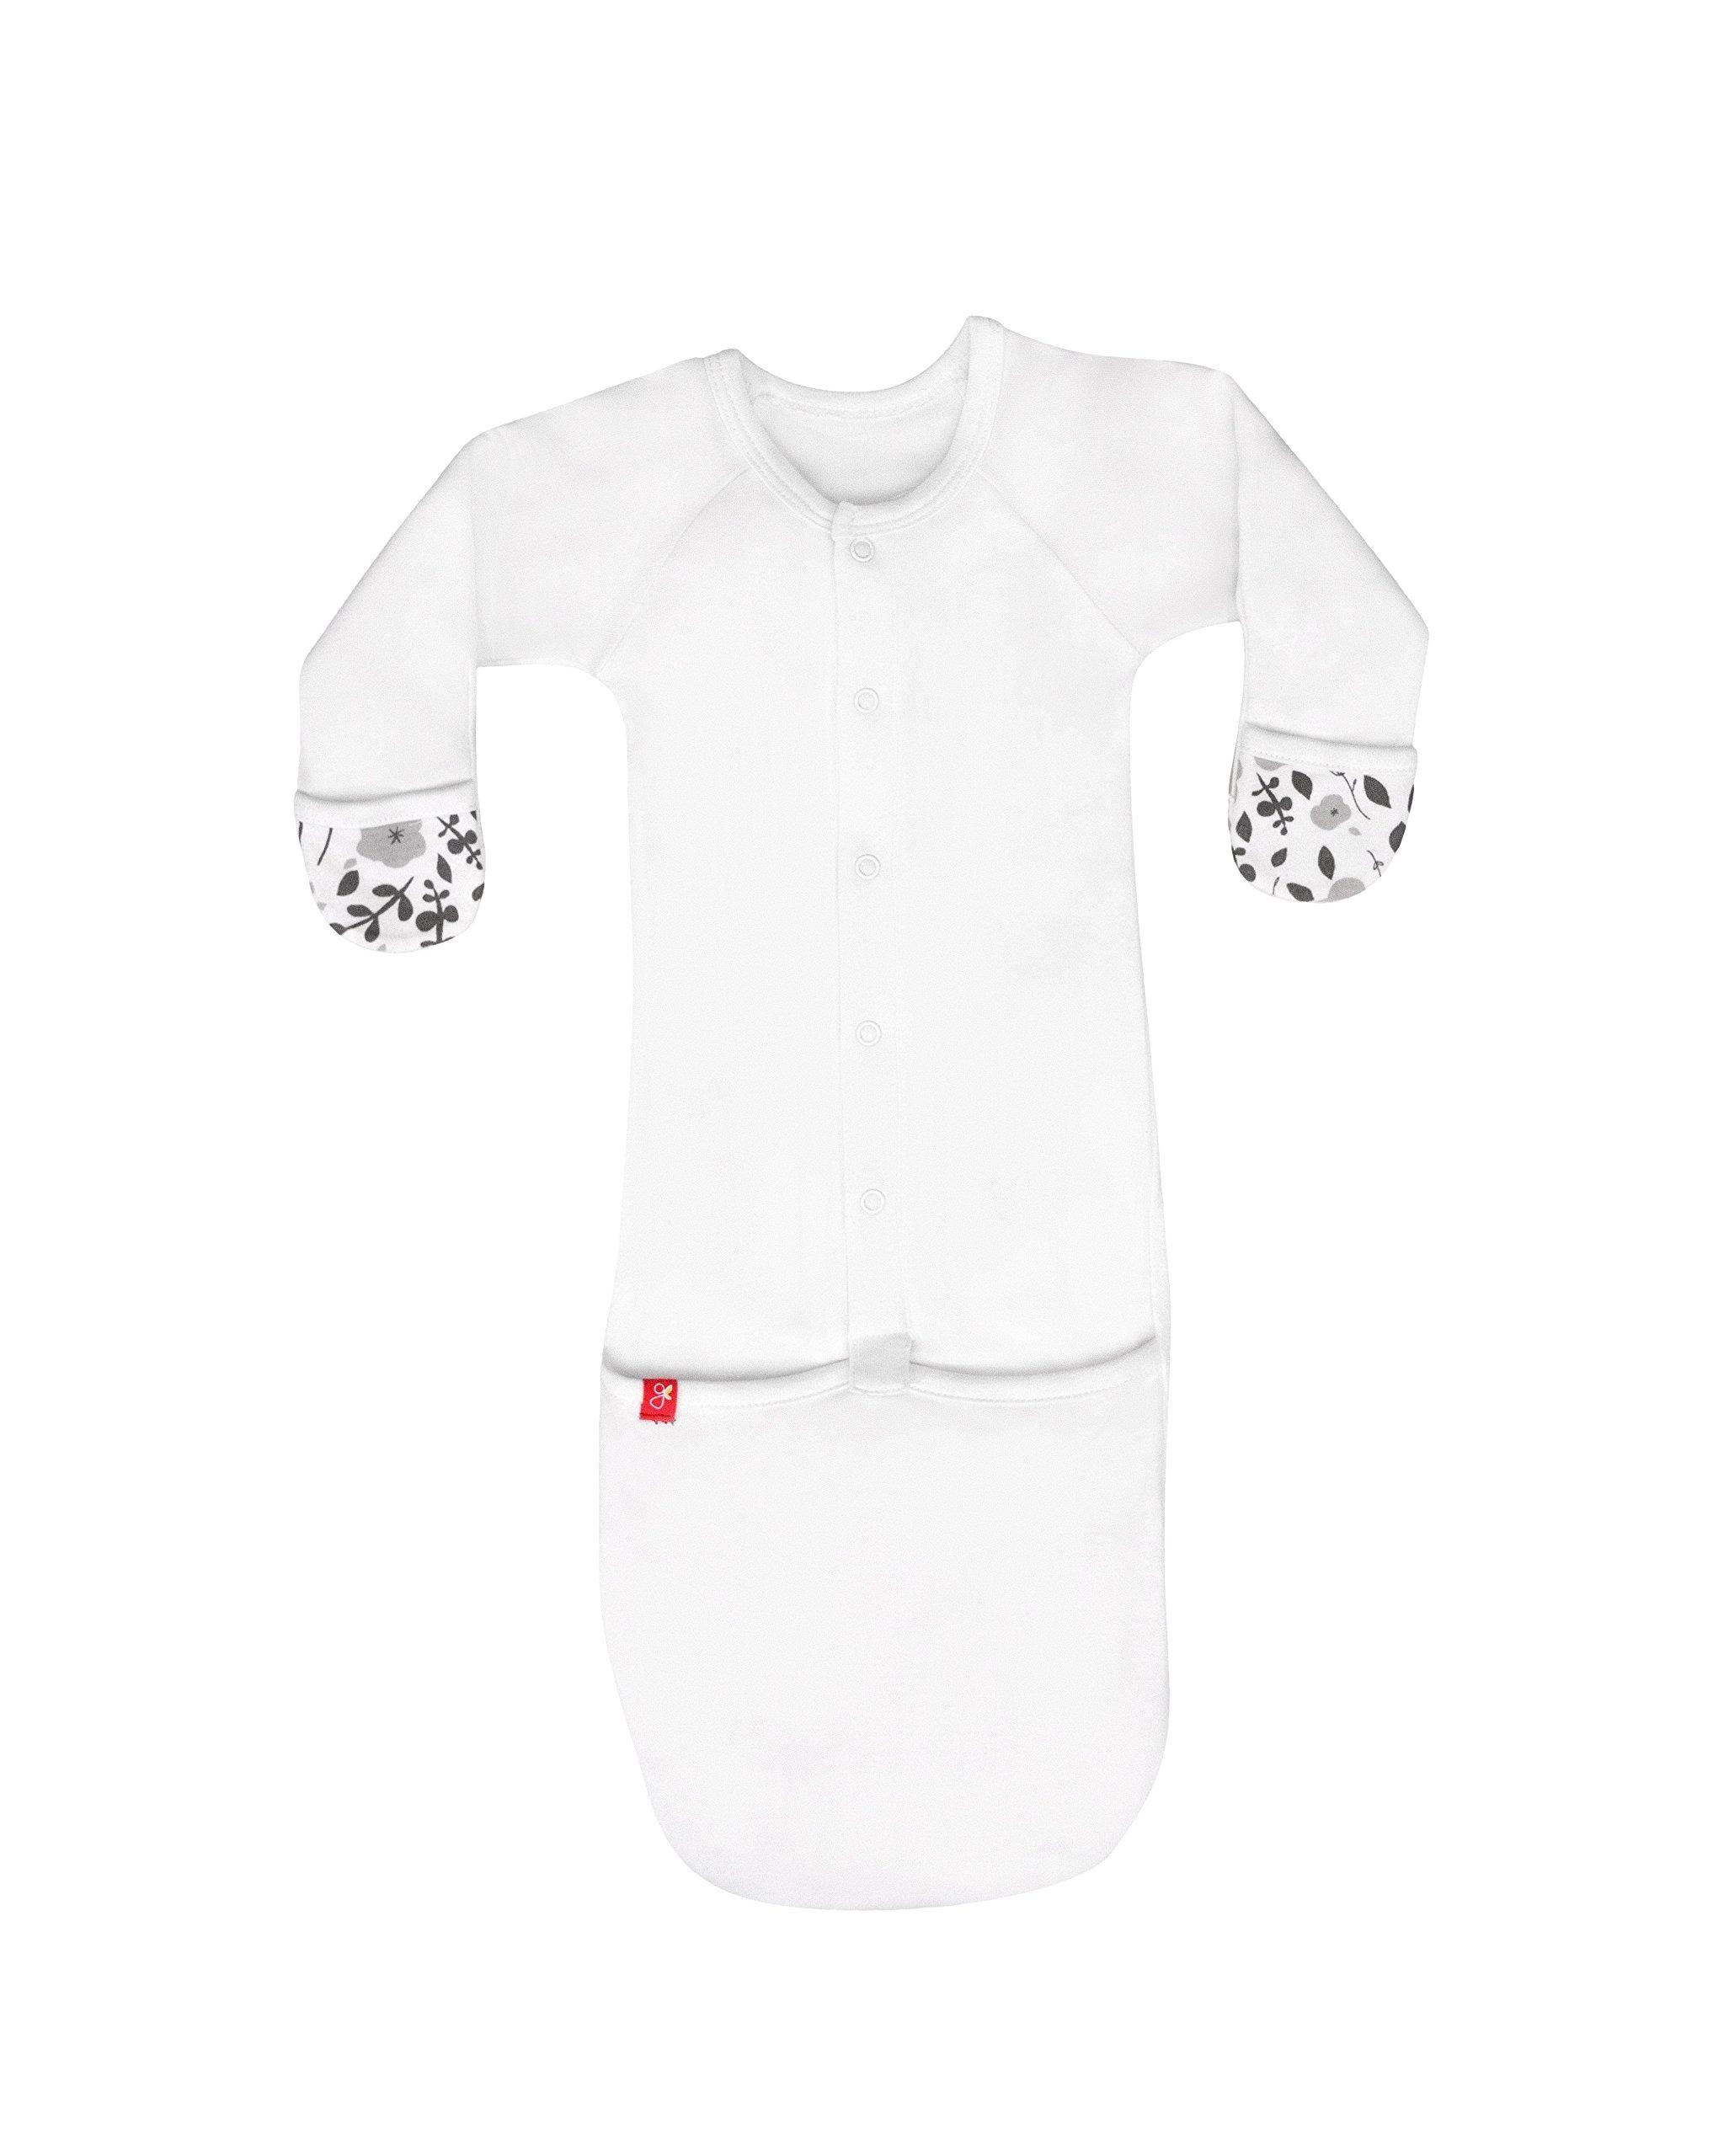 Baby Pajamas, Convertible Slip-On Sleep Sack